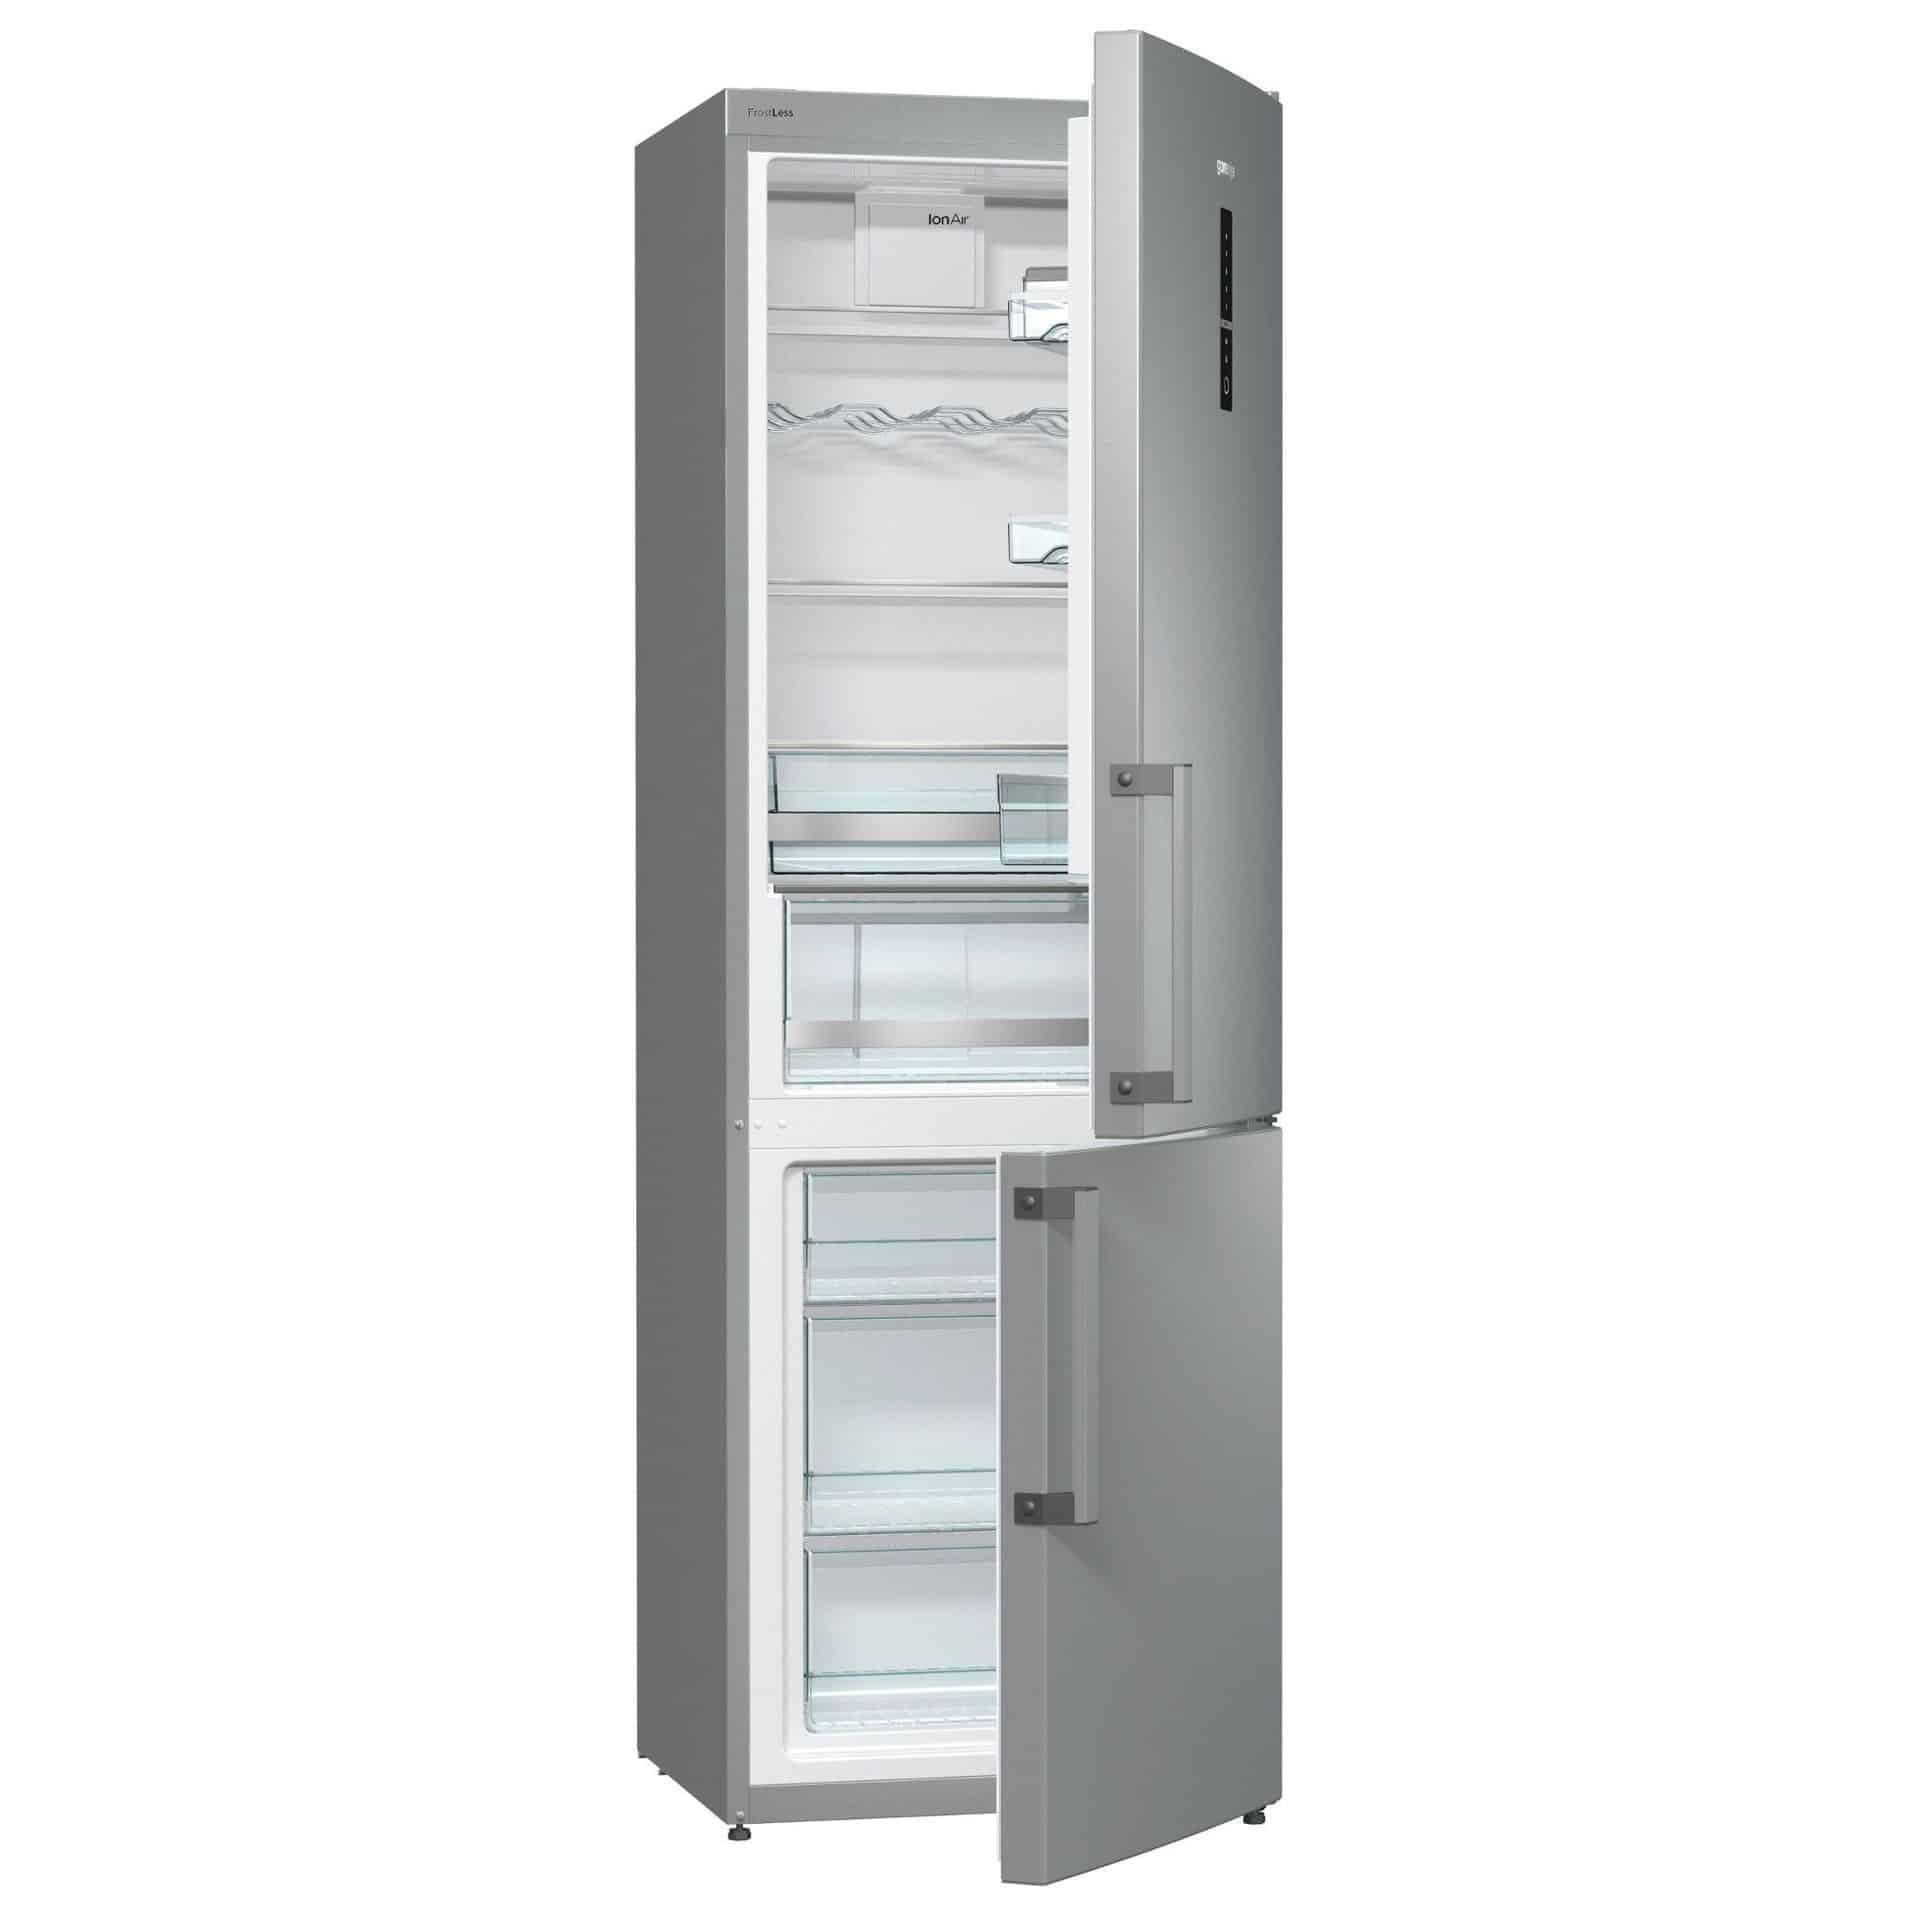 Combina frigorifica Gorenje RK6192LX, 322 l, Clasa A++, Inox - noutate de la producatorul sloven